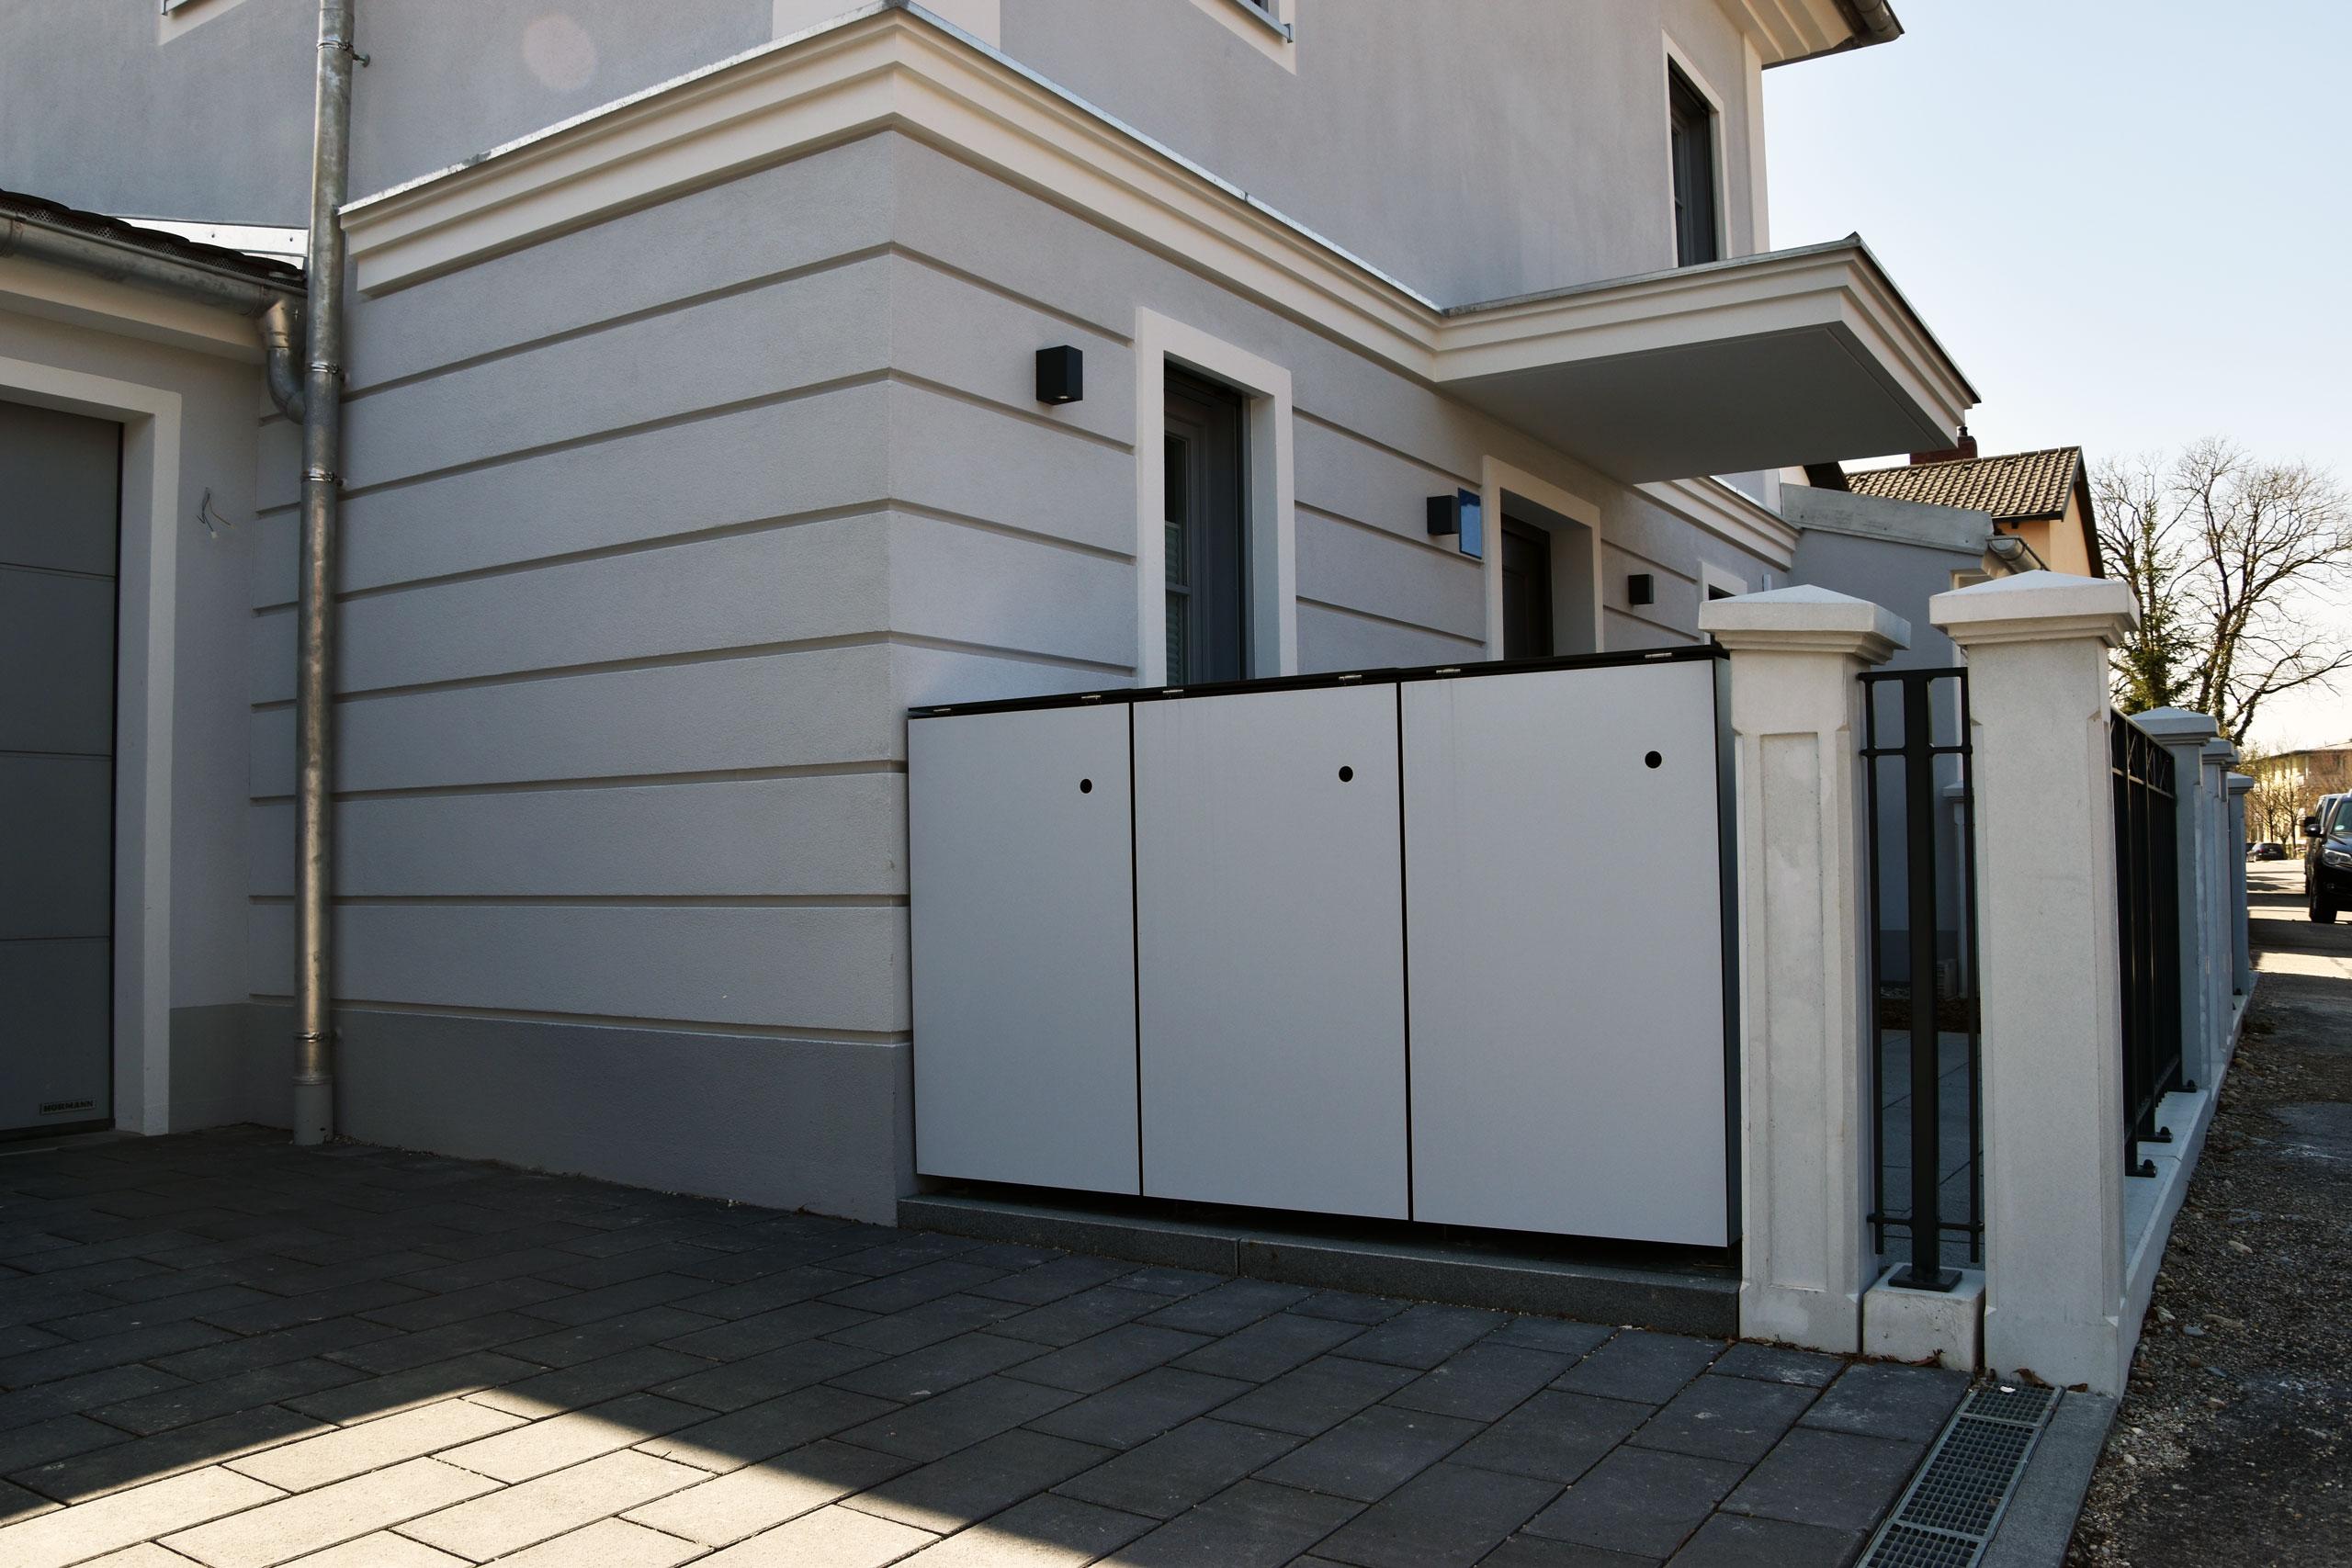 MÜTO – Design Mülltonnenbox in Pasing-Obermenzing München